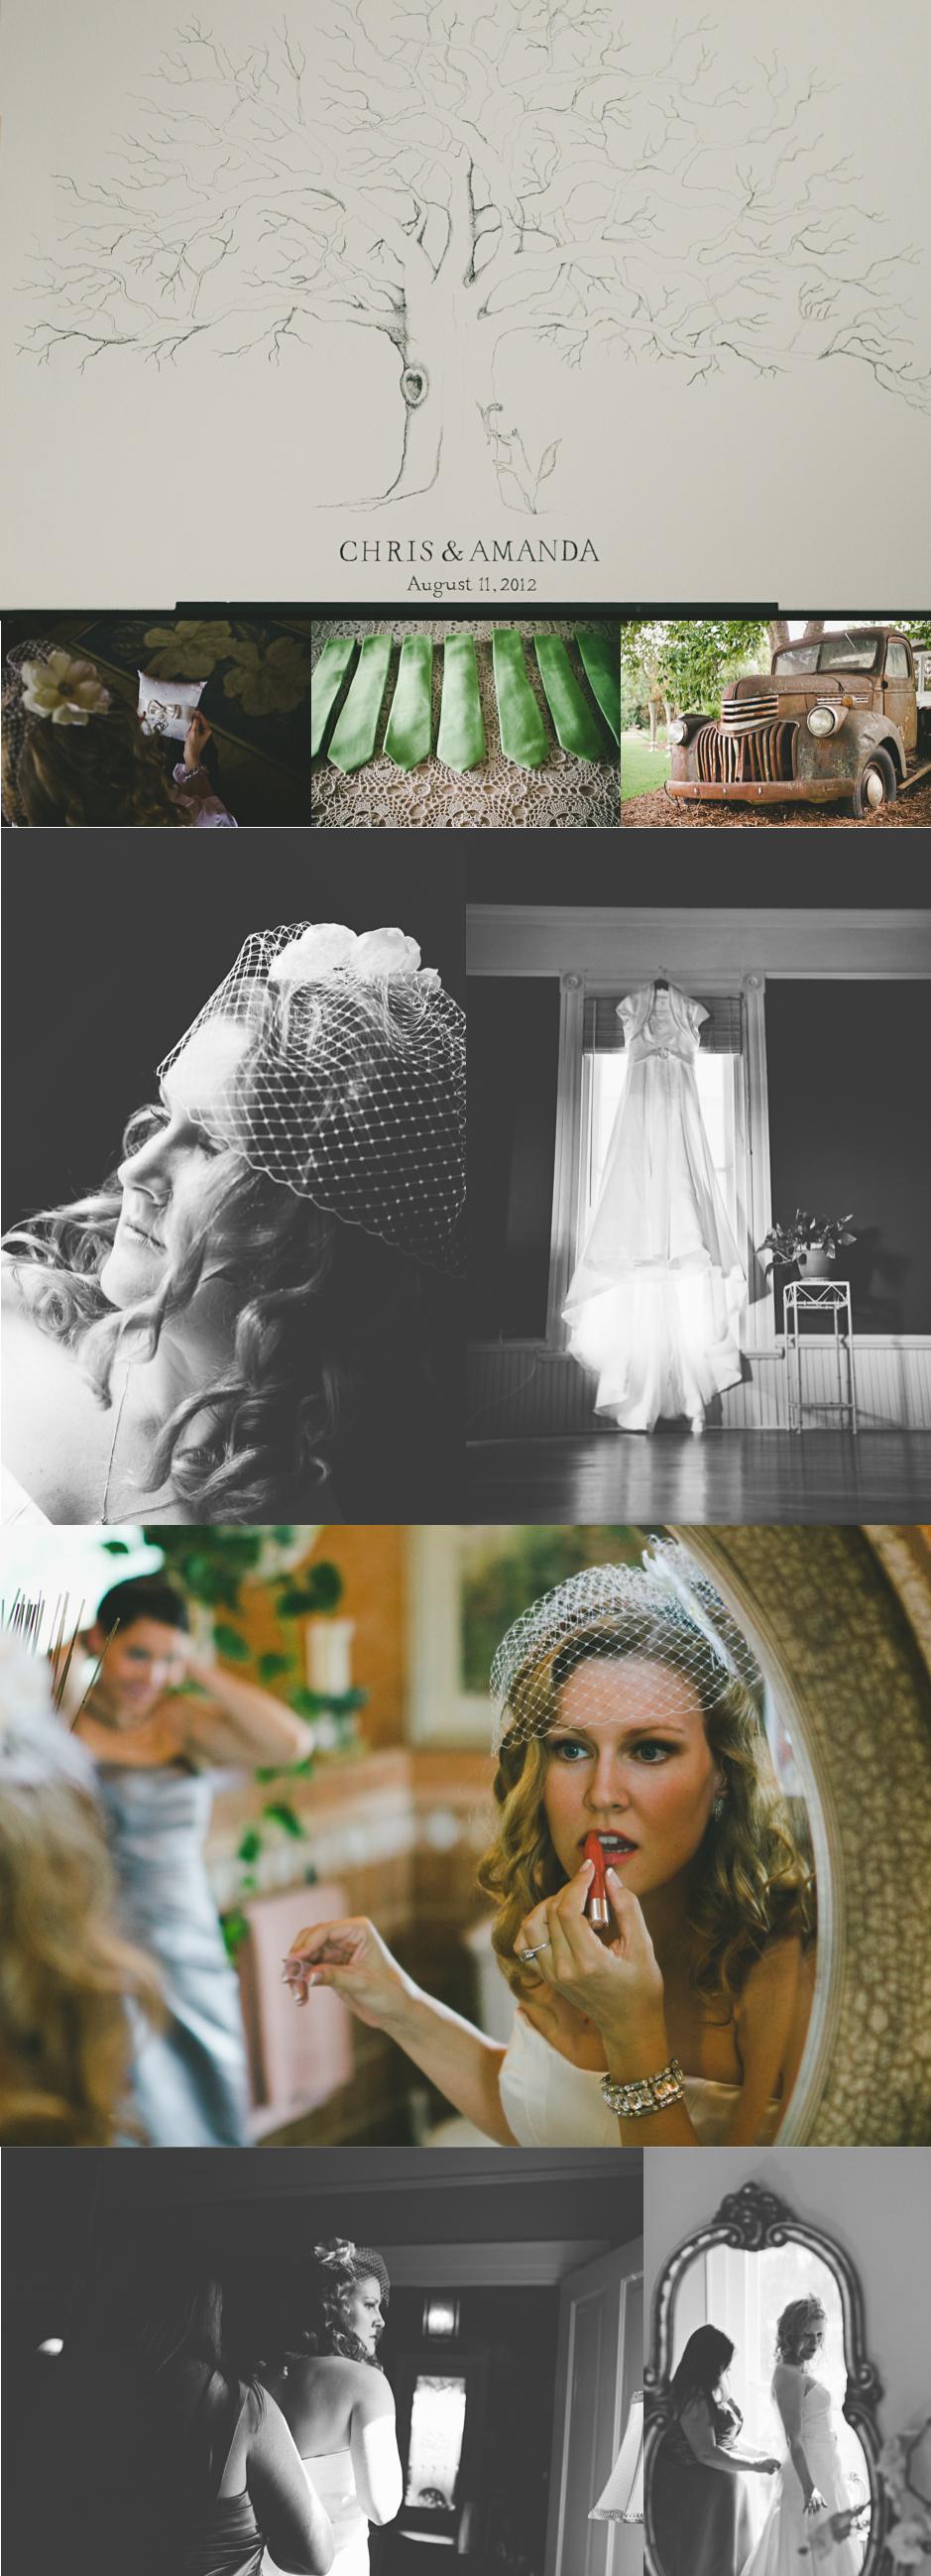 FrecklesAndLocks20120811_AmandaChris_Wedding_Collage1-1